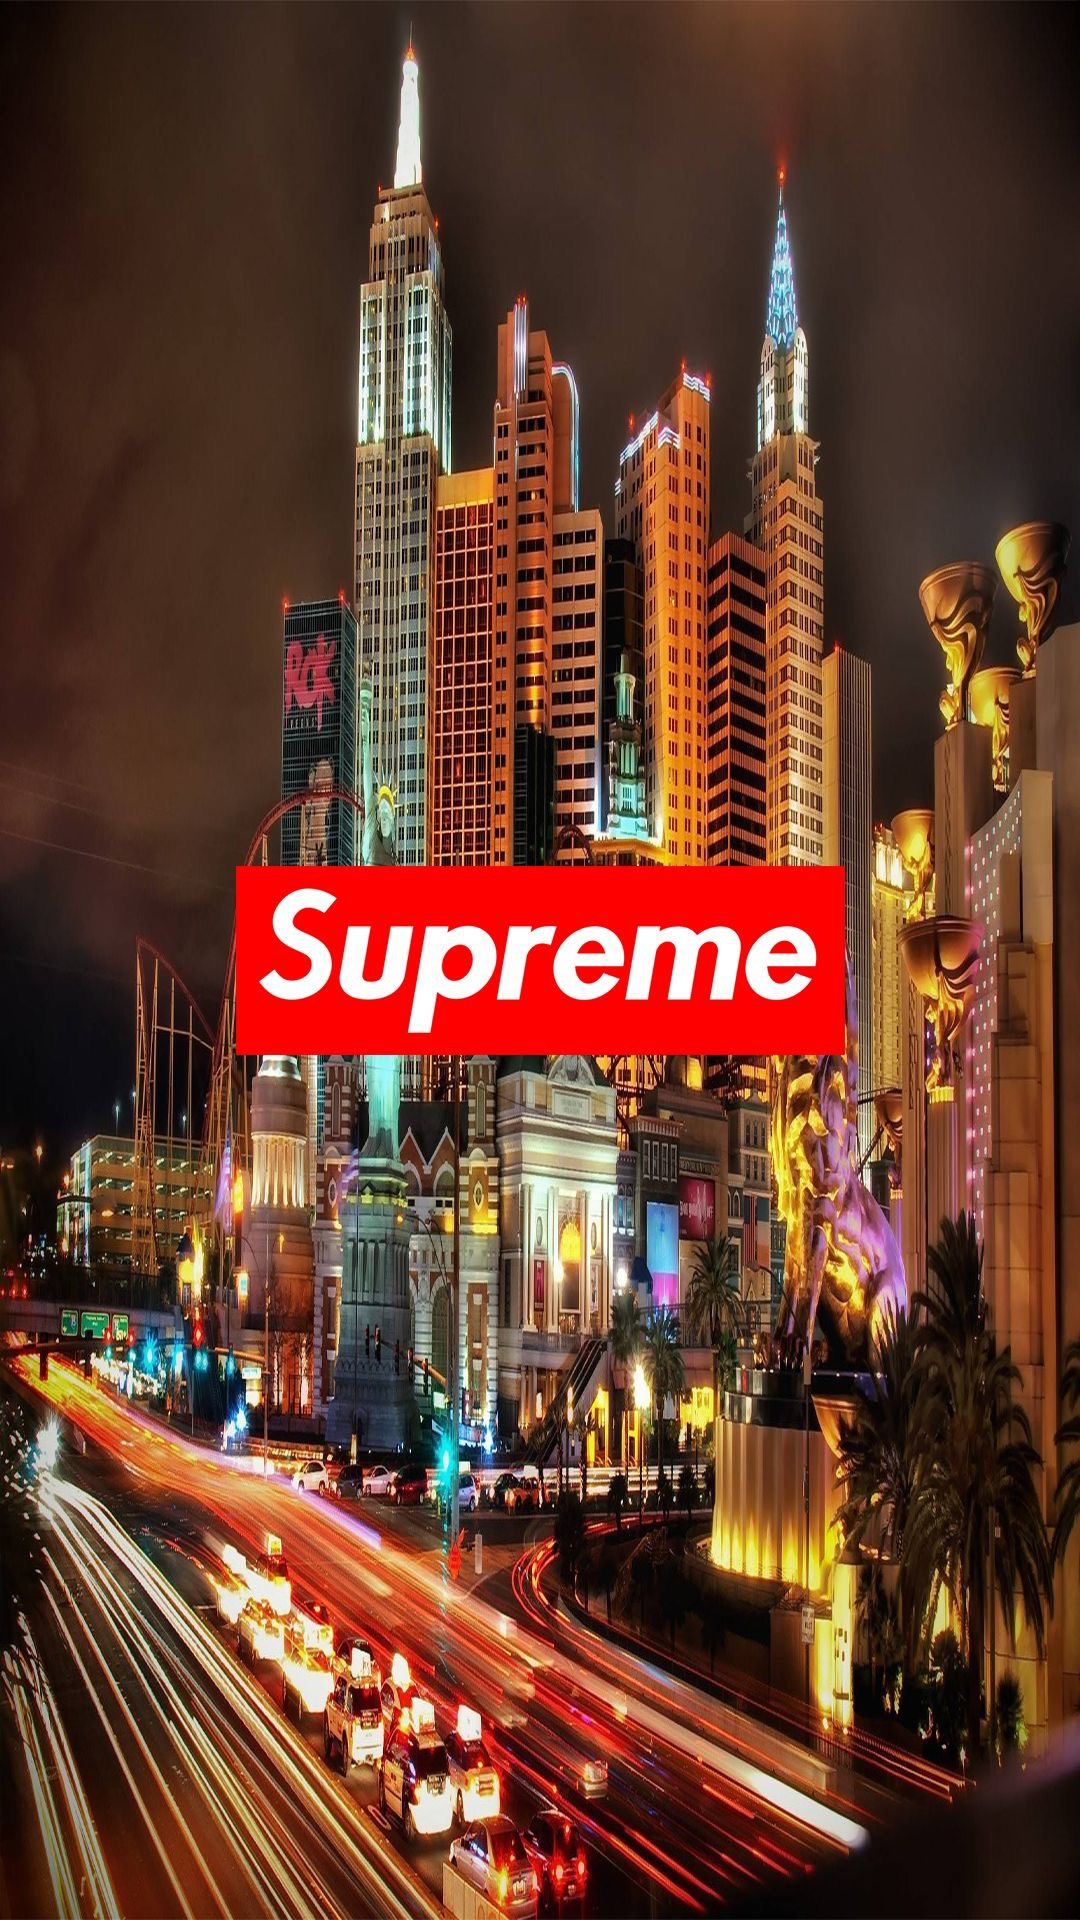 Supreme Iphone Wallpaper Iphone Wallpaper